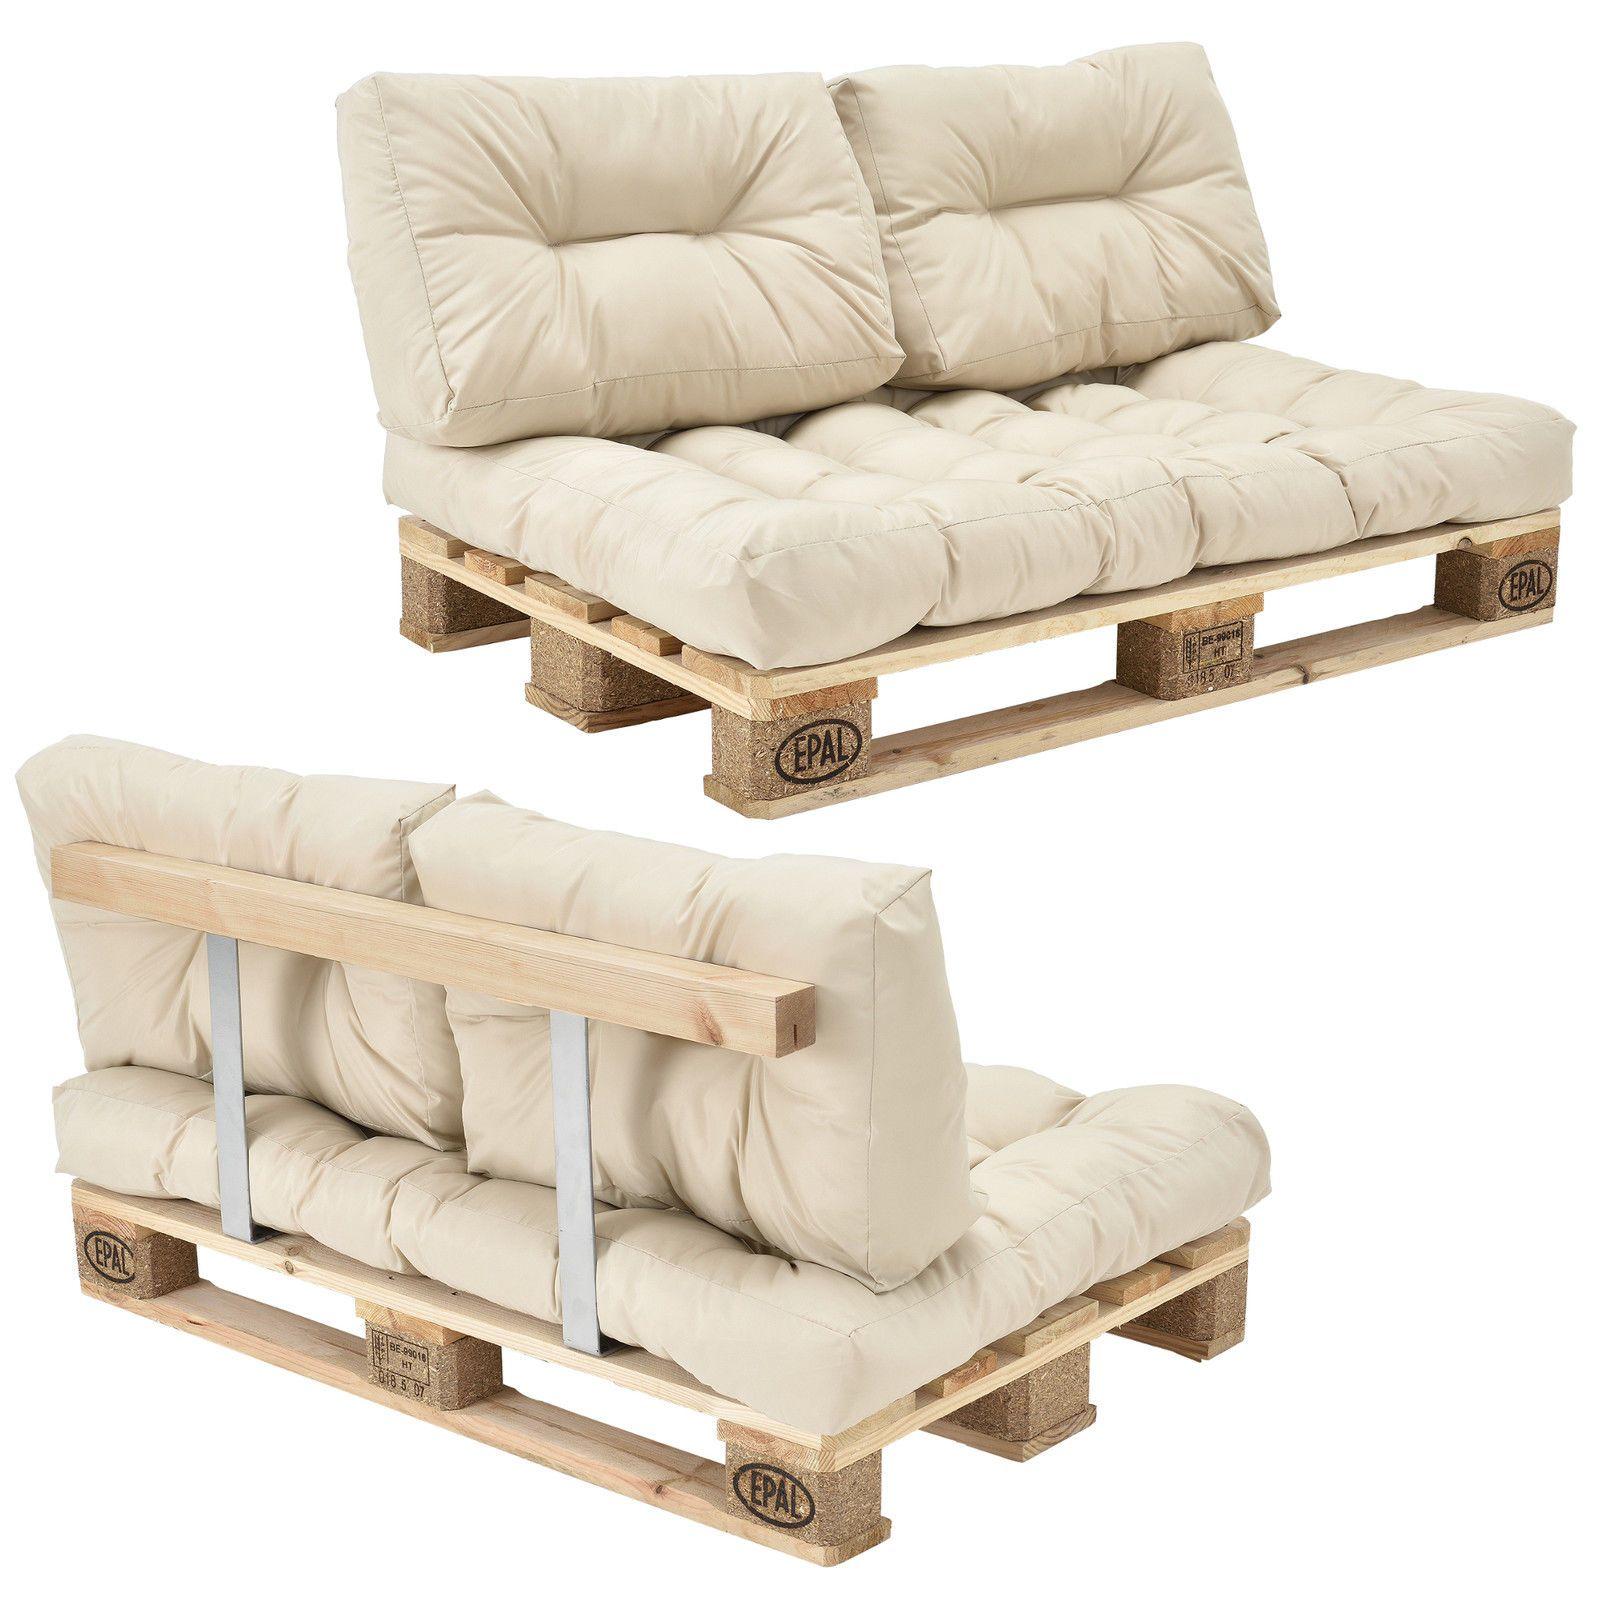 pallet sofa for sale craigslist atlanta bed en casa euro palets sofá beige 2 plazas con cojín